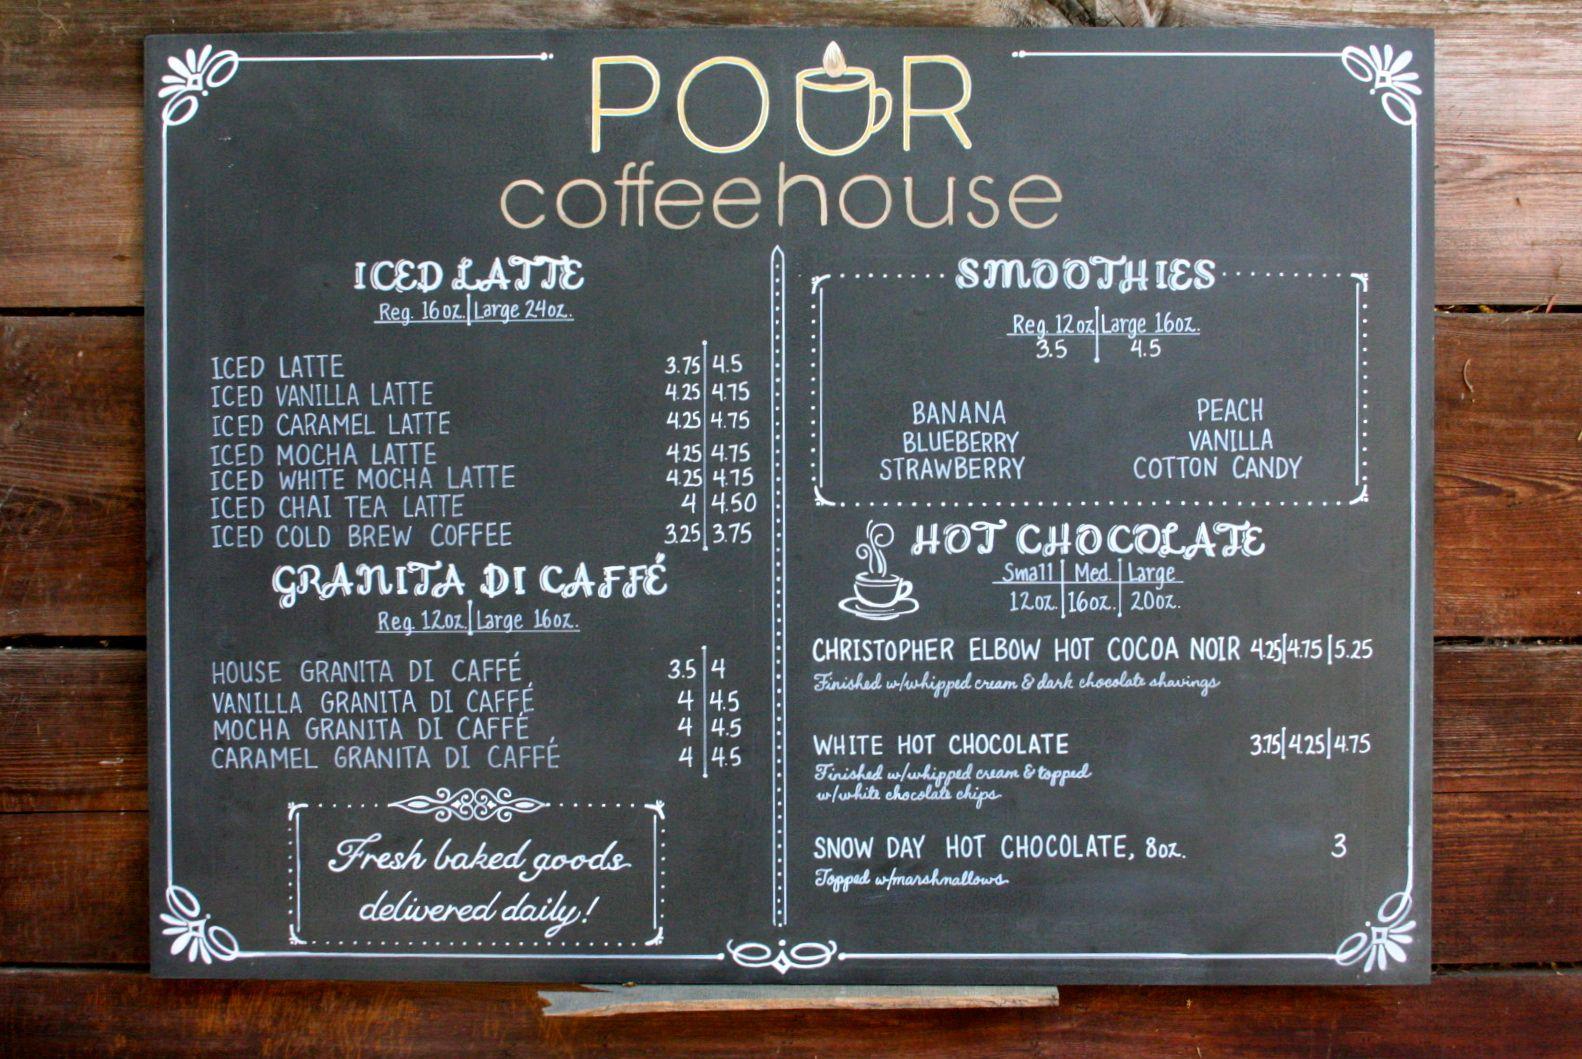 Coffee Shop Menu For Pour Coffeehouse In Kansas One Of A Set Of Three Coffee Shop Menu My Coffee Shop Coffee Chalkboard